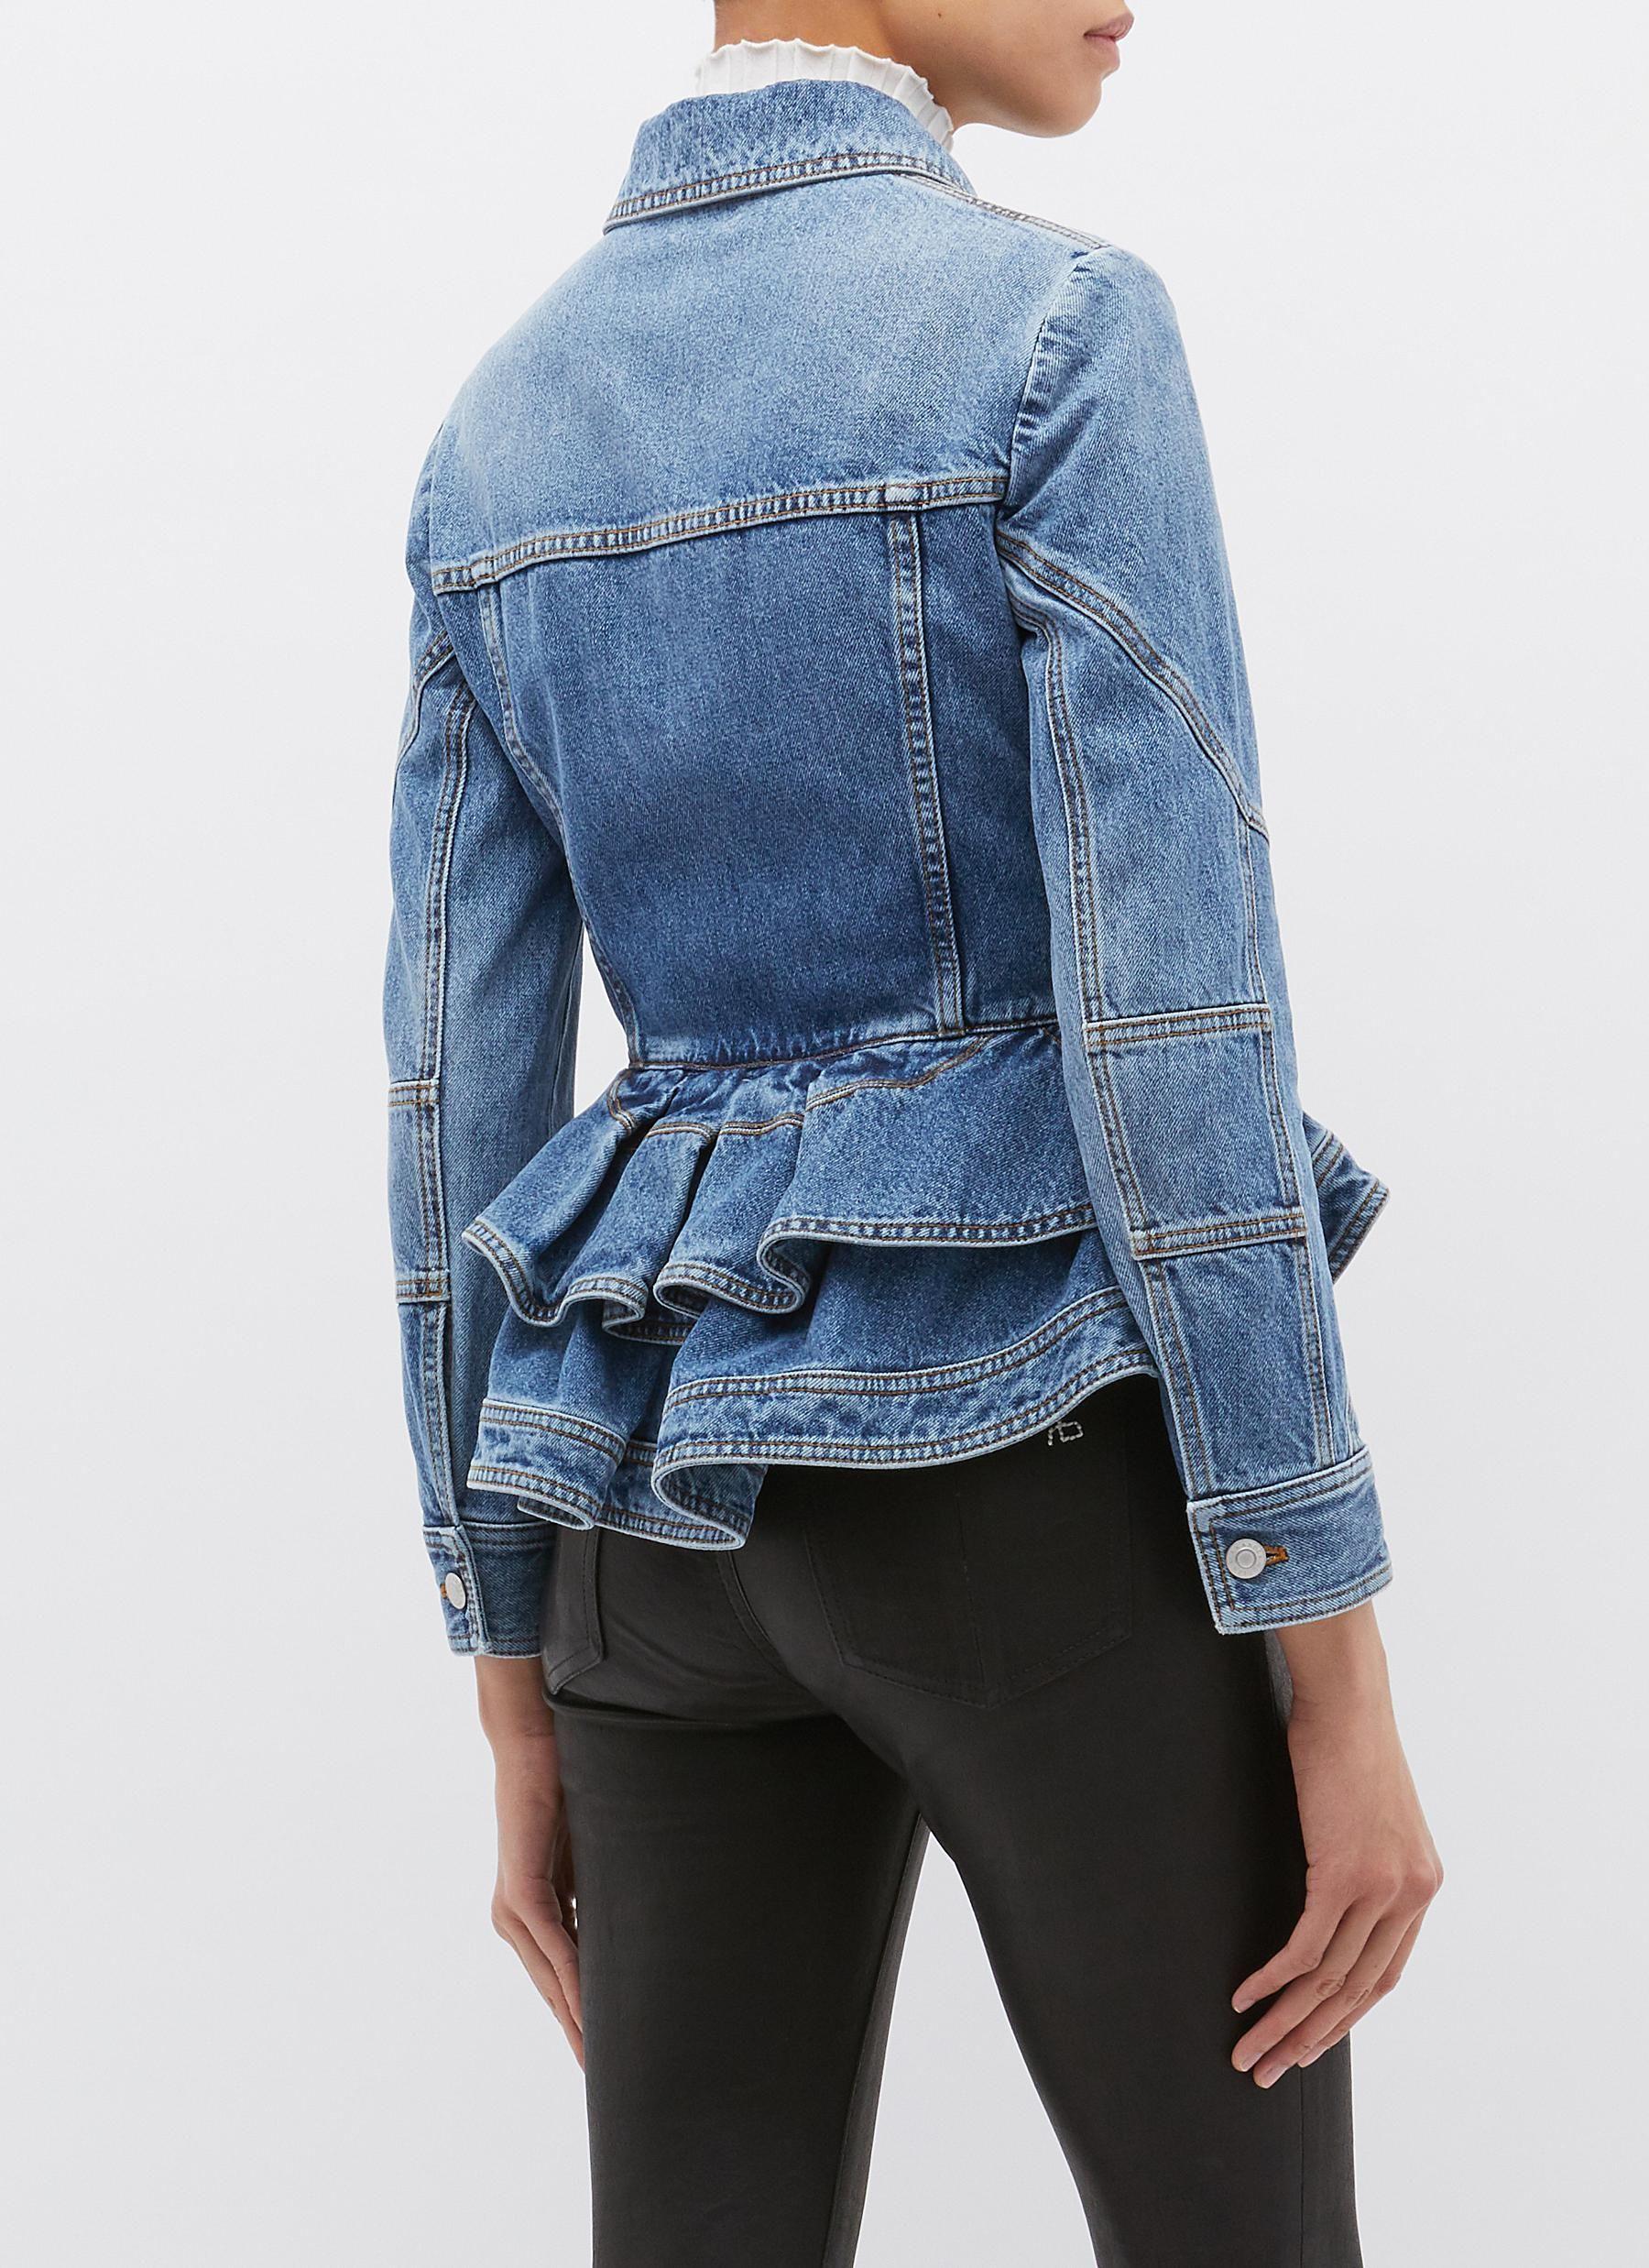 Back View Click To Enlarge Alexander Mcqueen Denim Peplum Jacket Denim Fashion Peplum Jacket Fashion [ 2475 x 1800 Pixel ]